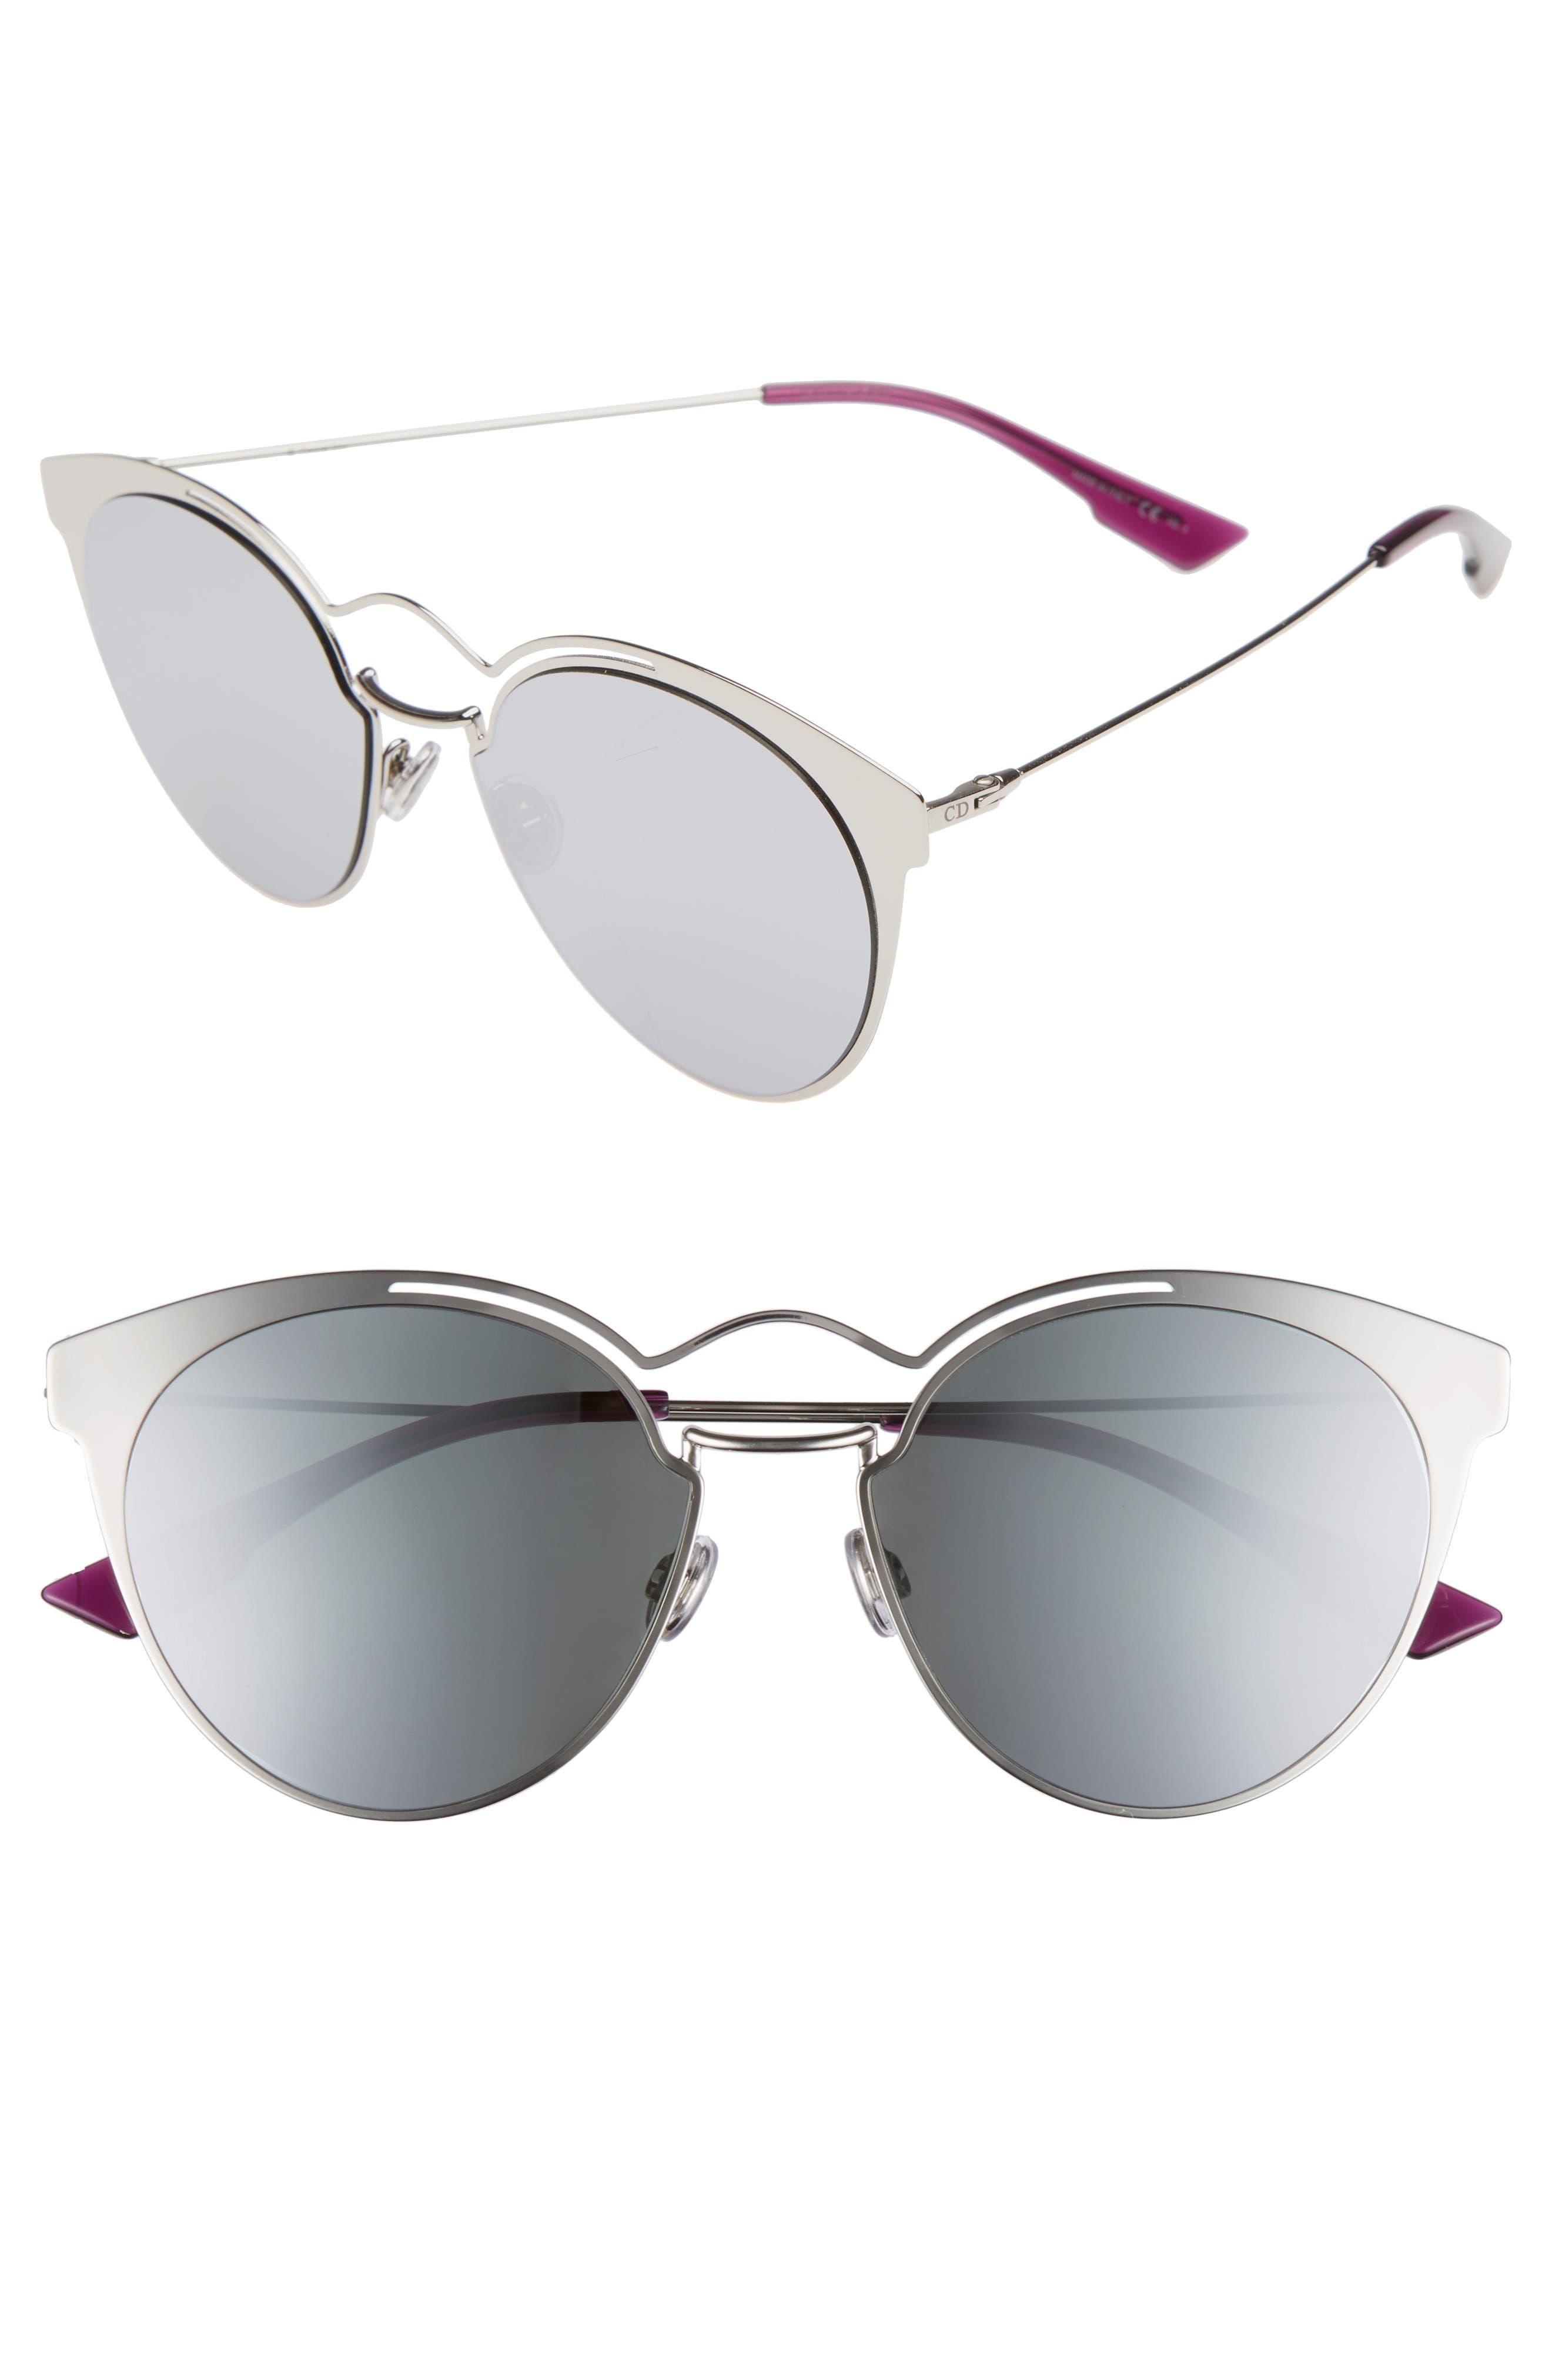 Alternate Image 1 Selected - Dior Nebuls 54mm Sunglasses